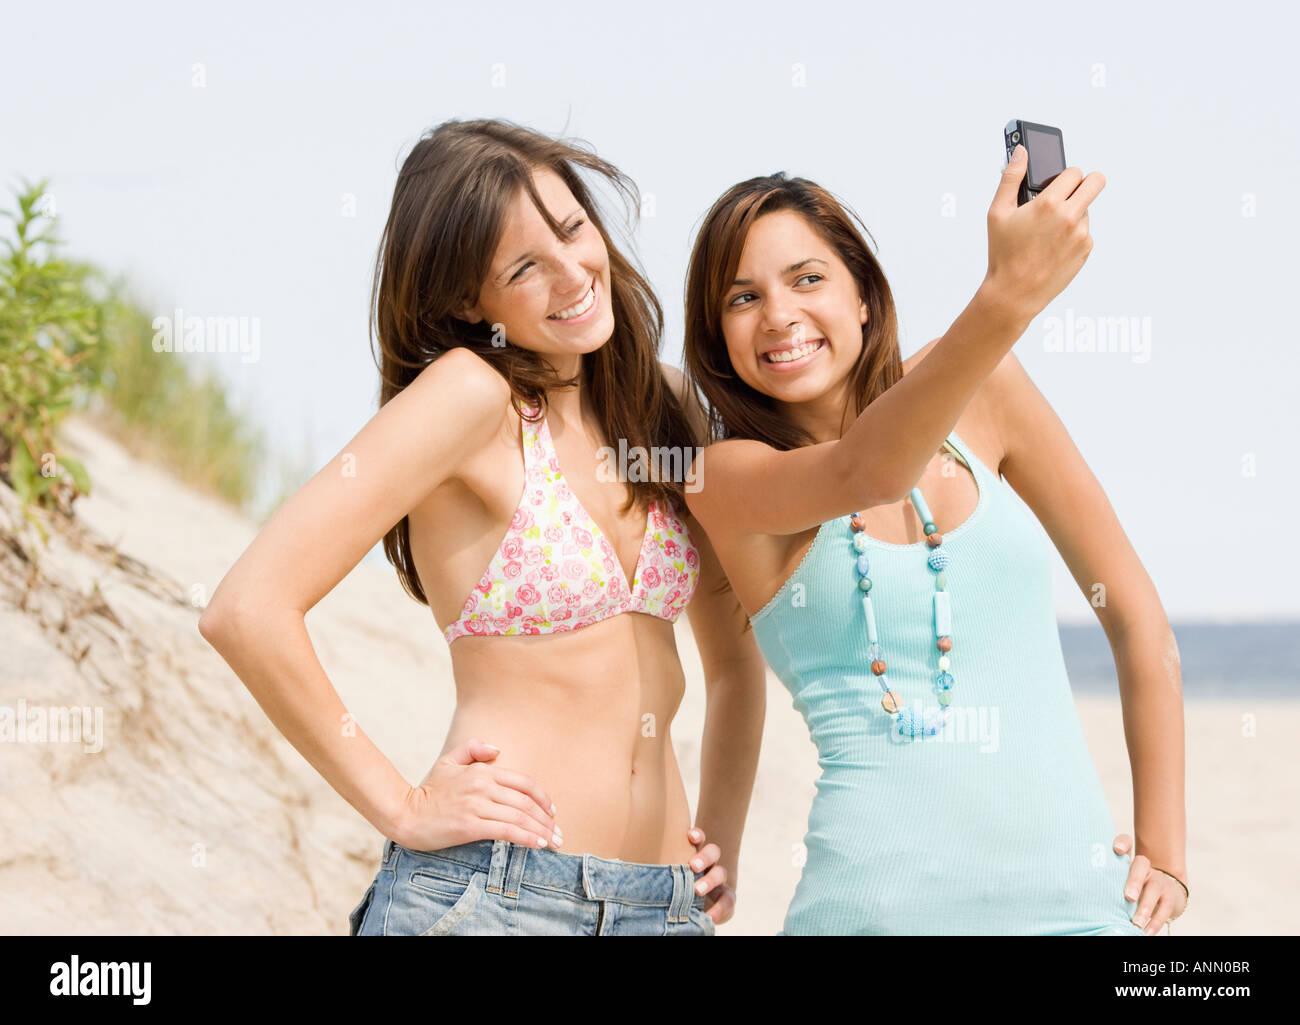 Les jeunes femmes taking own photograph Photo Stock